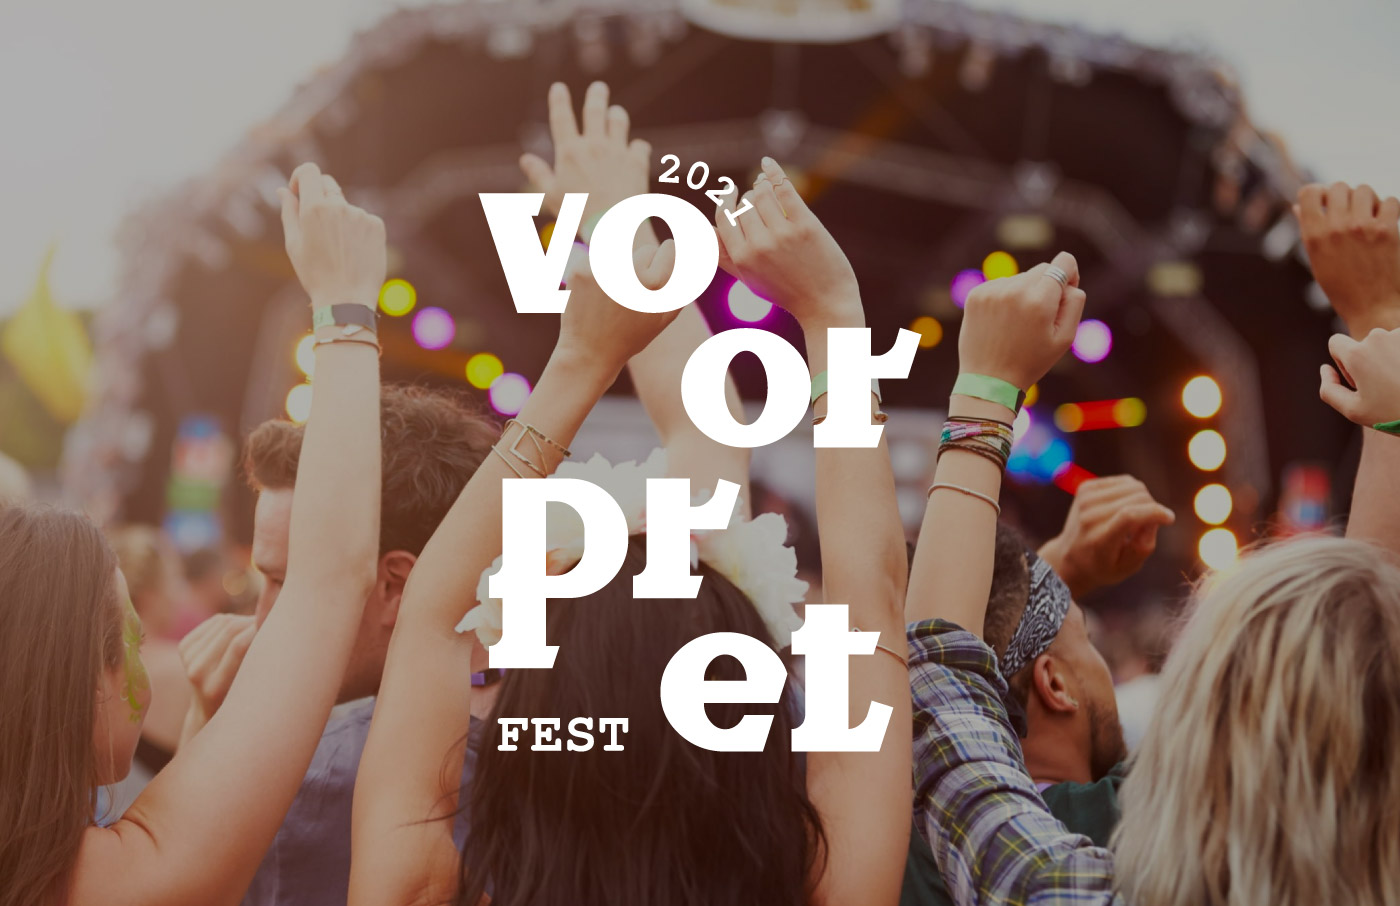 music festival concert logo design visual identity people having fun dancing